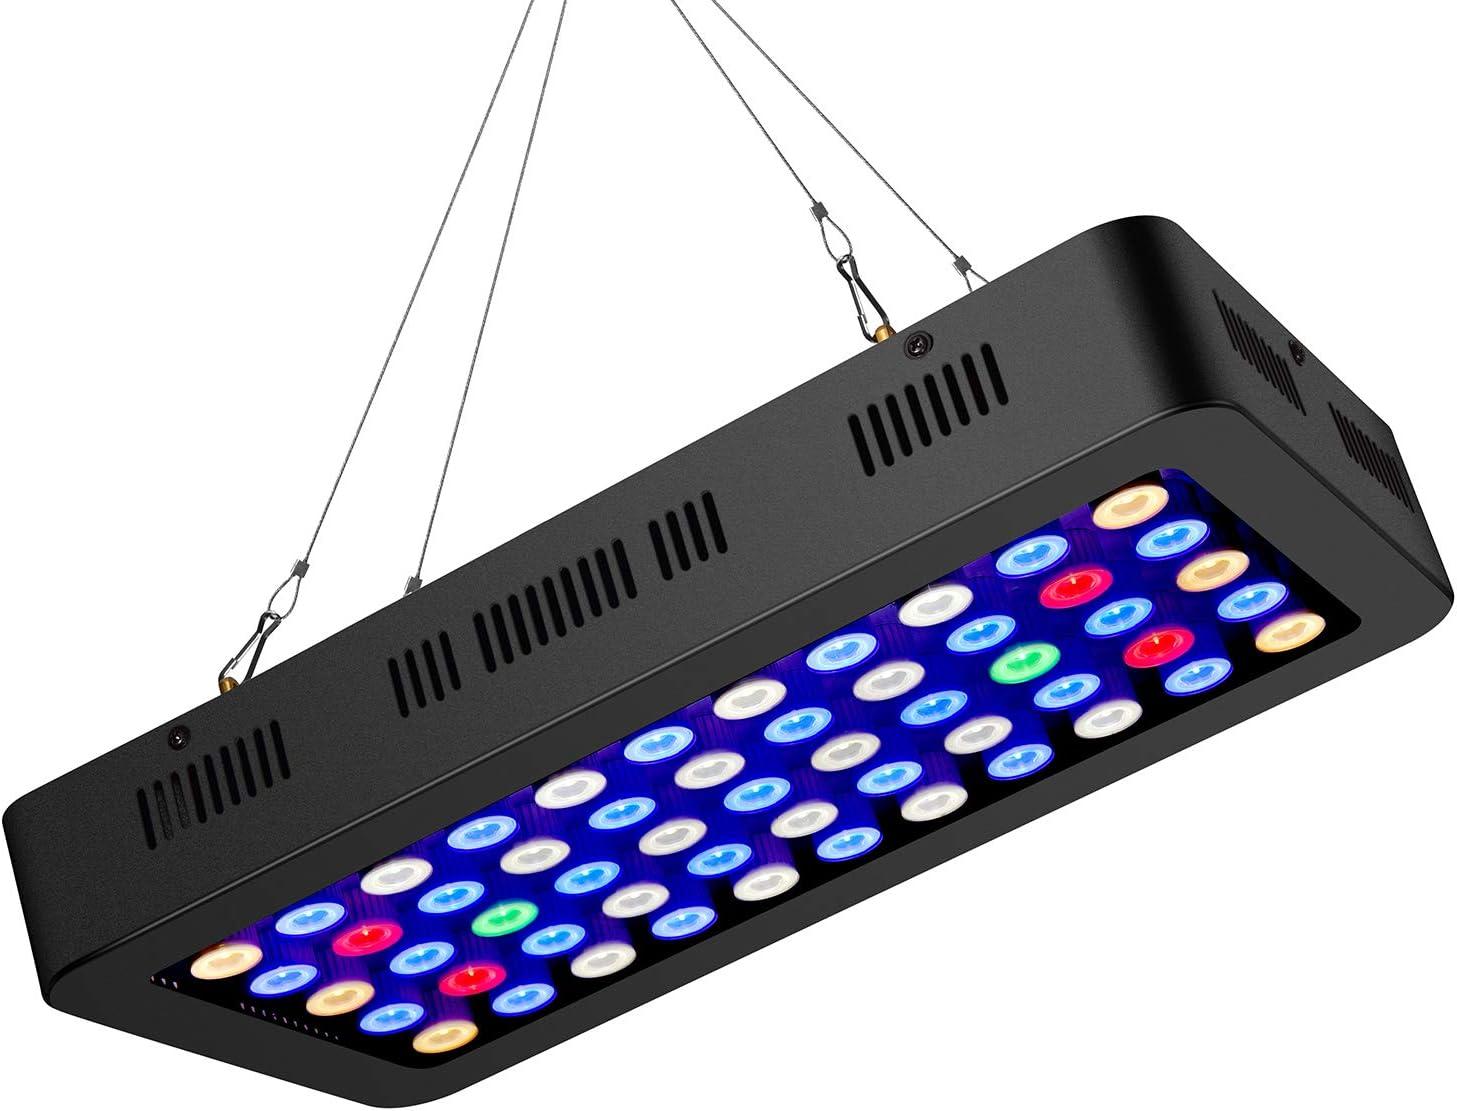 ZXMEAN 165W LED Aquarium Light